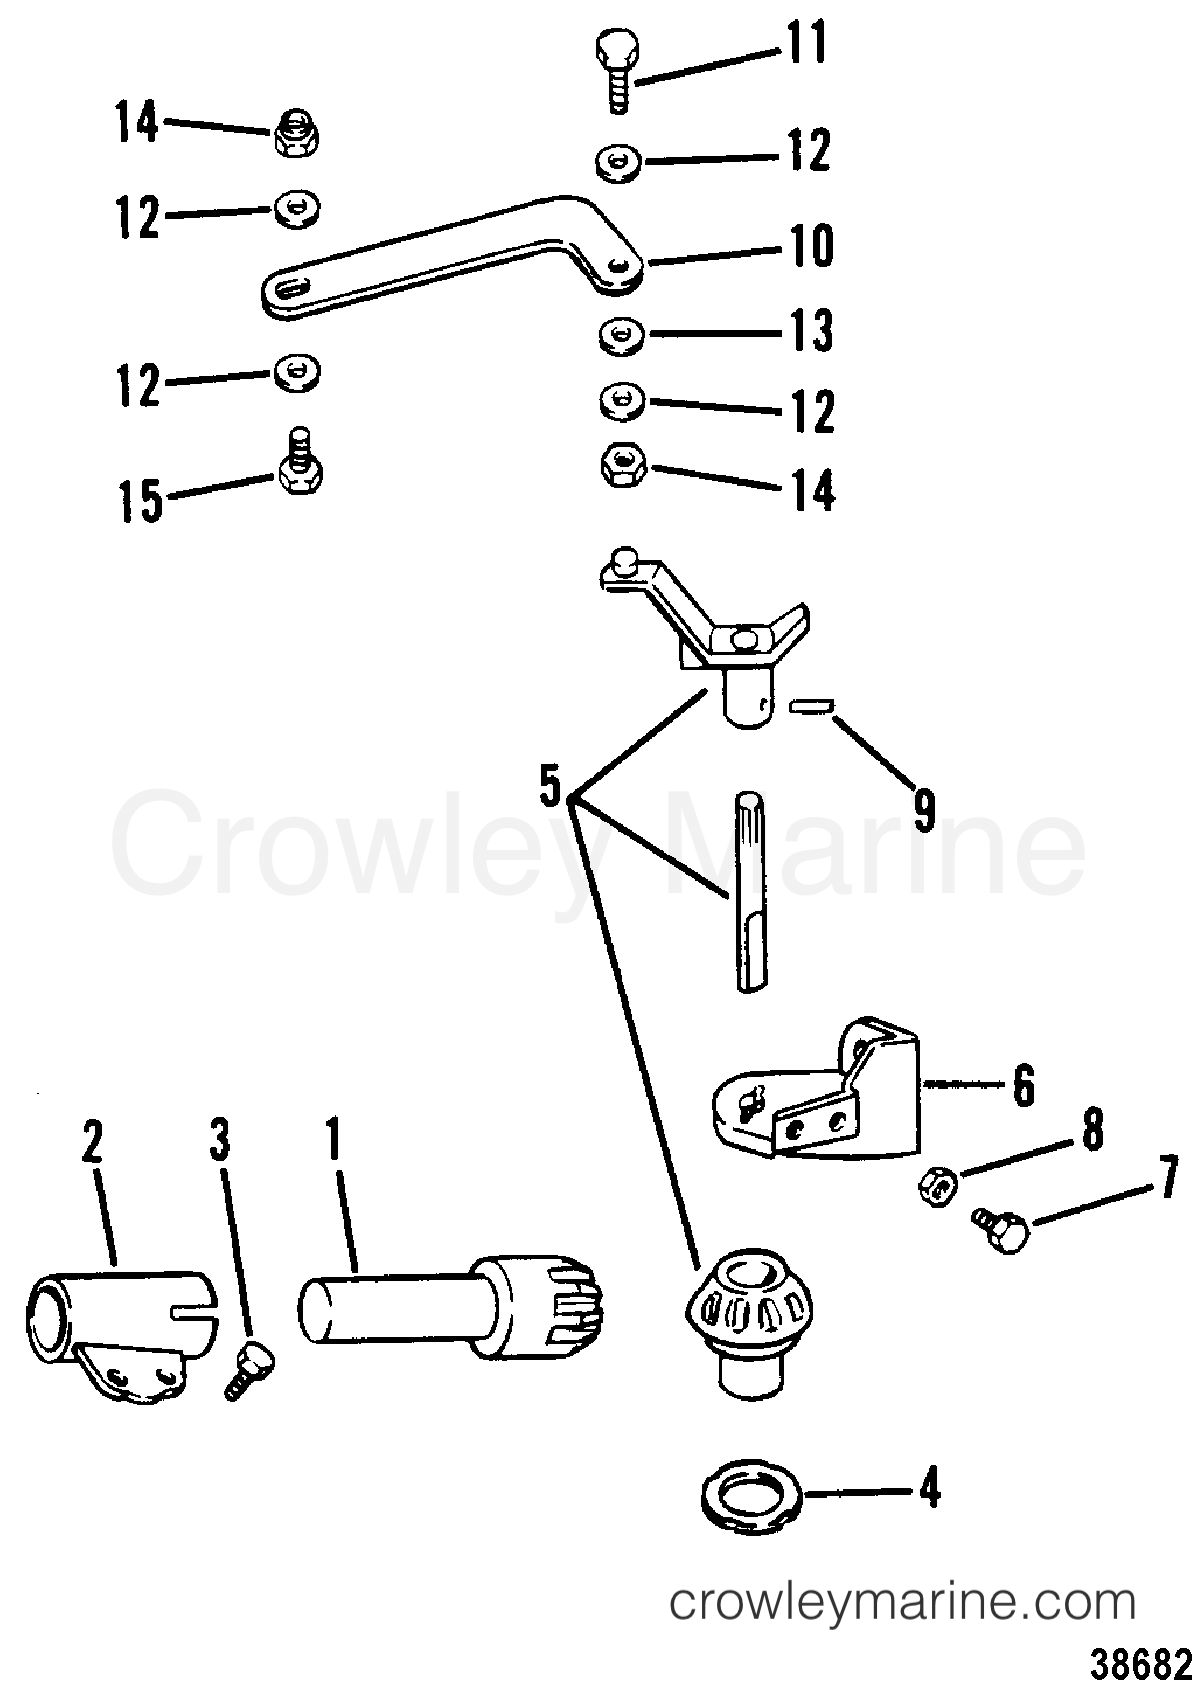 2013 150 Hp Etec Wiring Diagram : 31 Wiring Diagram Images